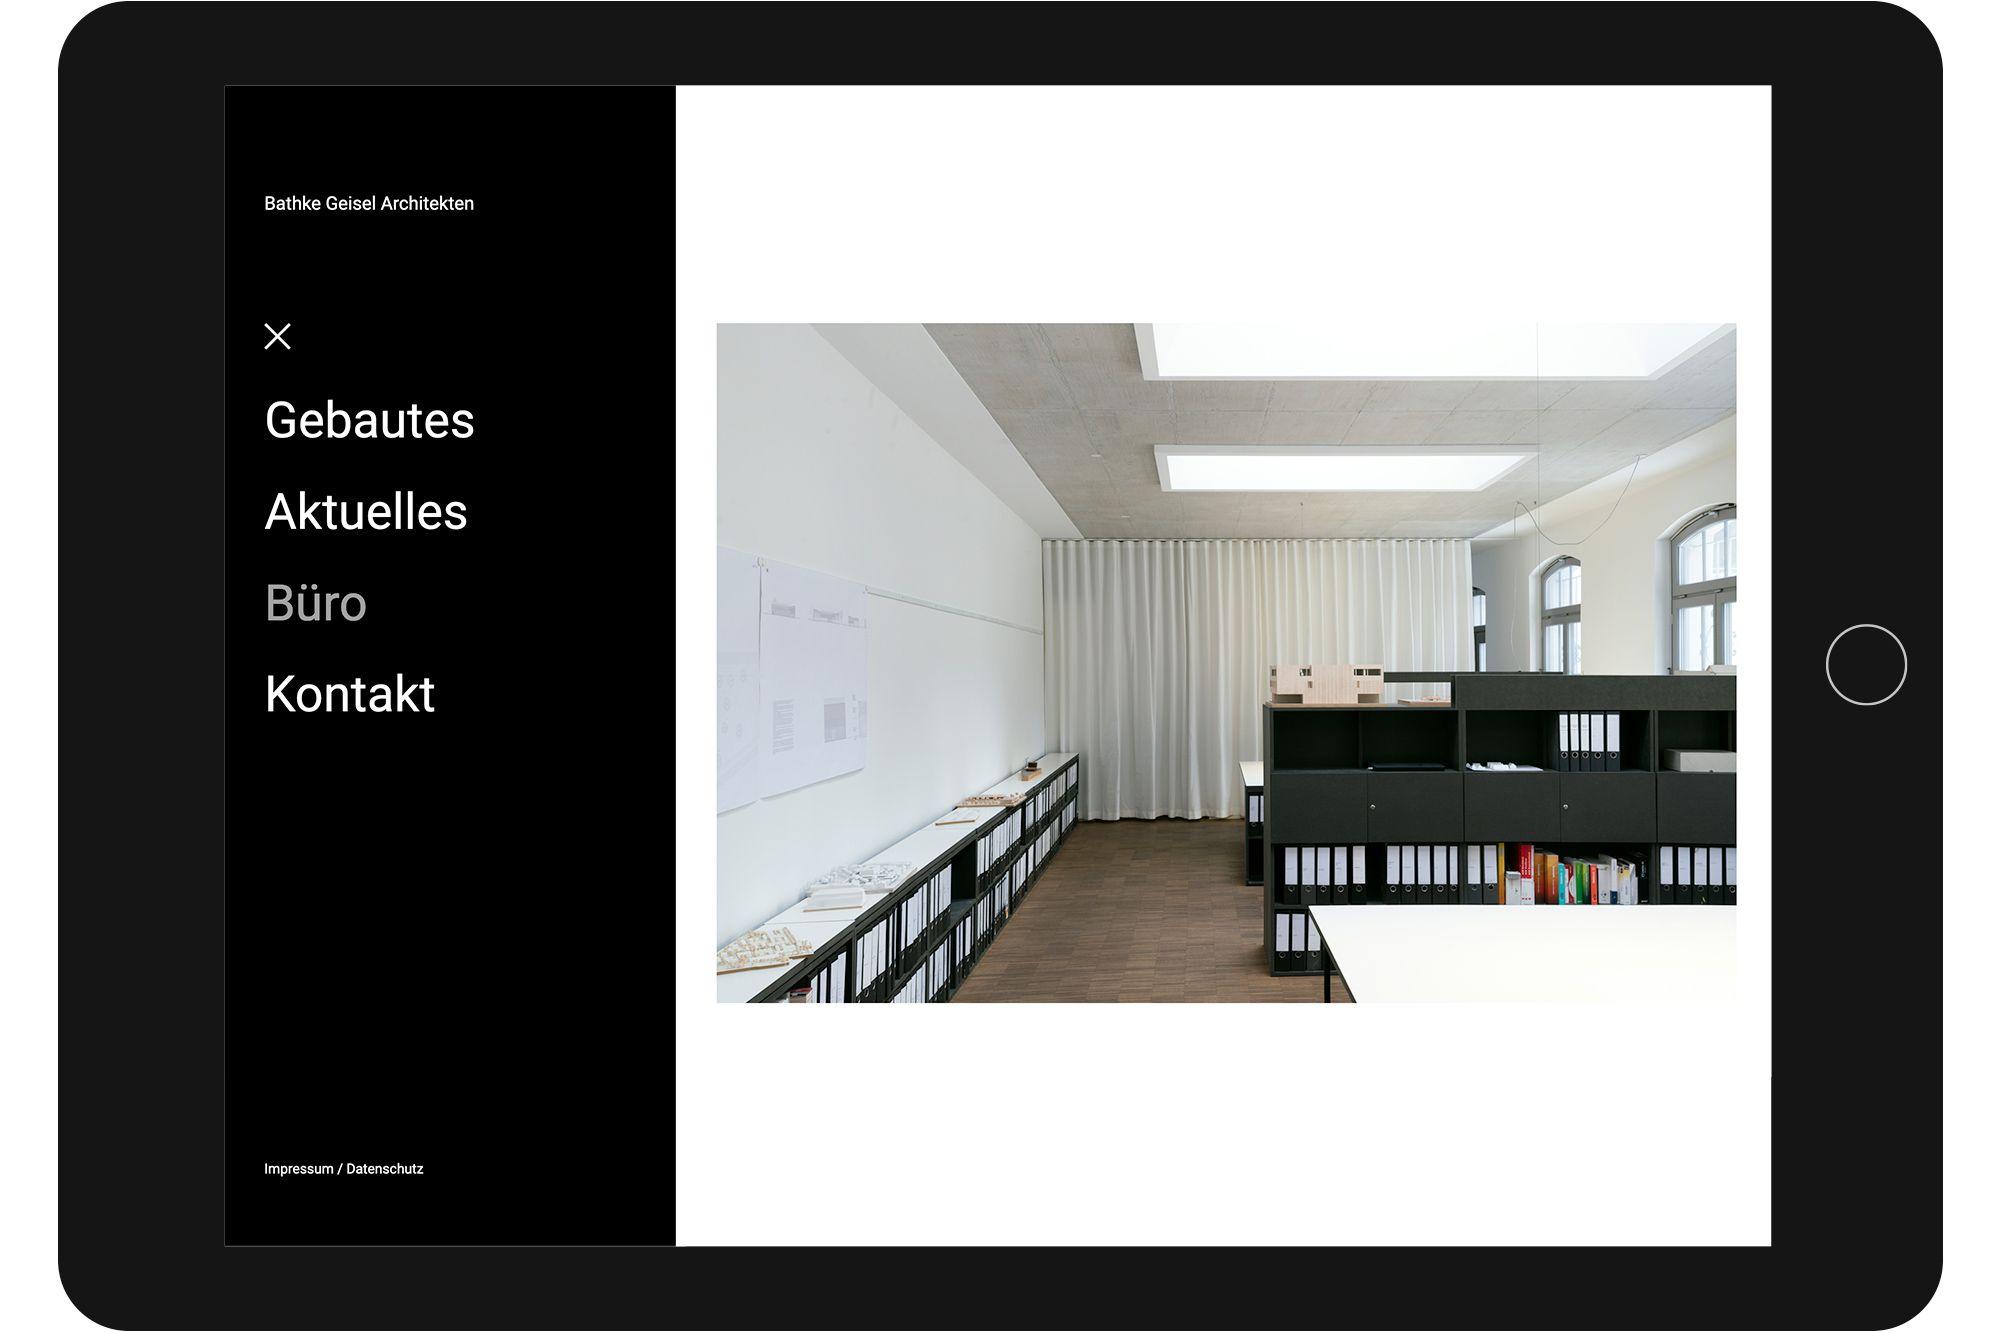 Bathke Geisel Website Dummies 02